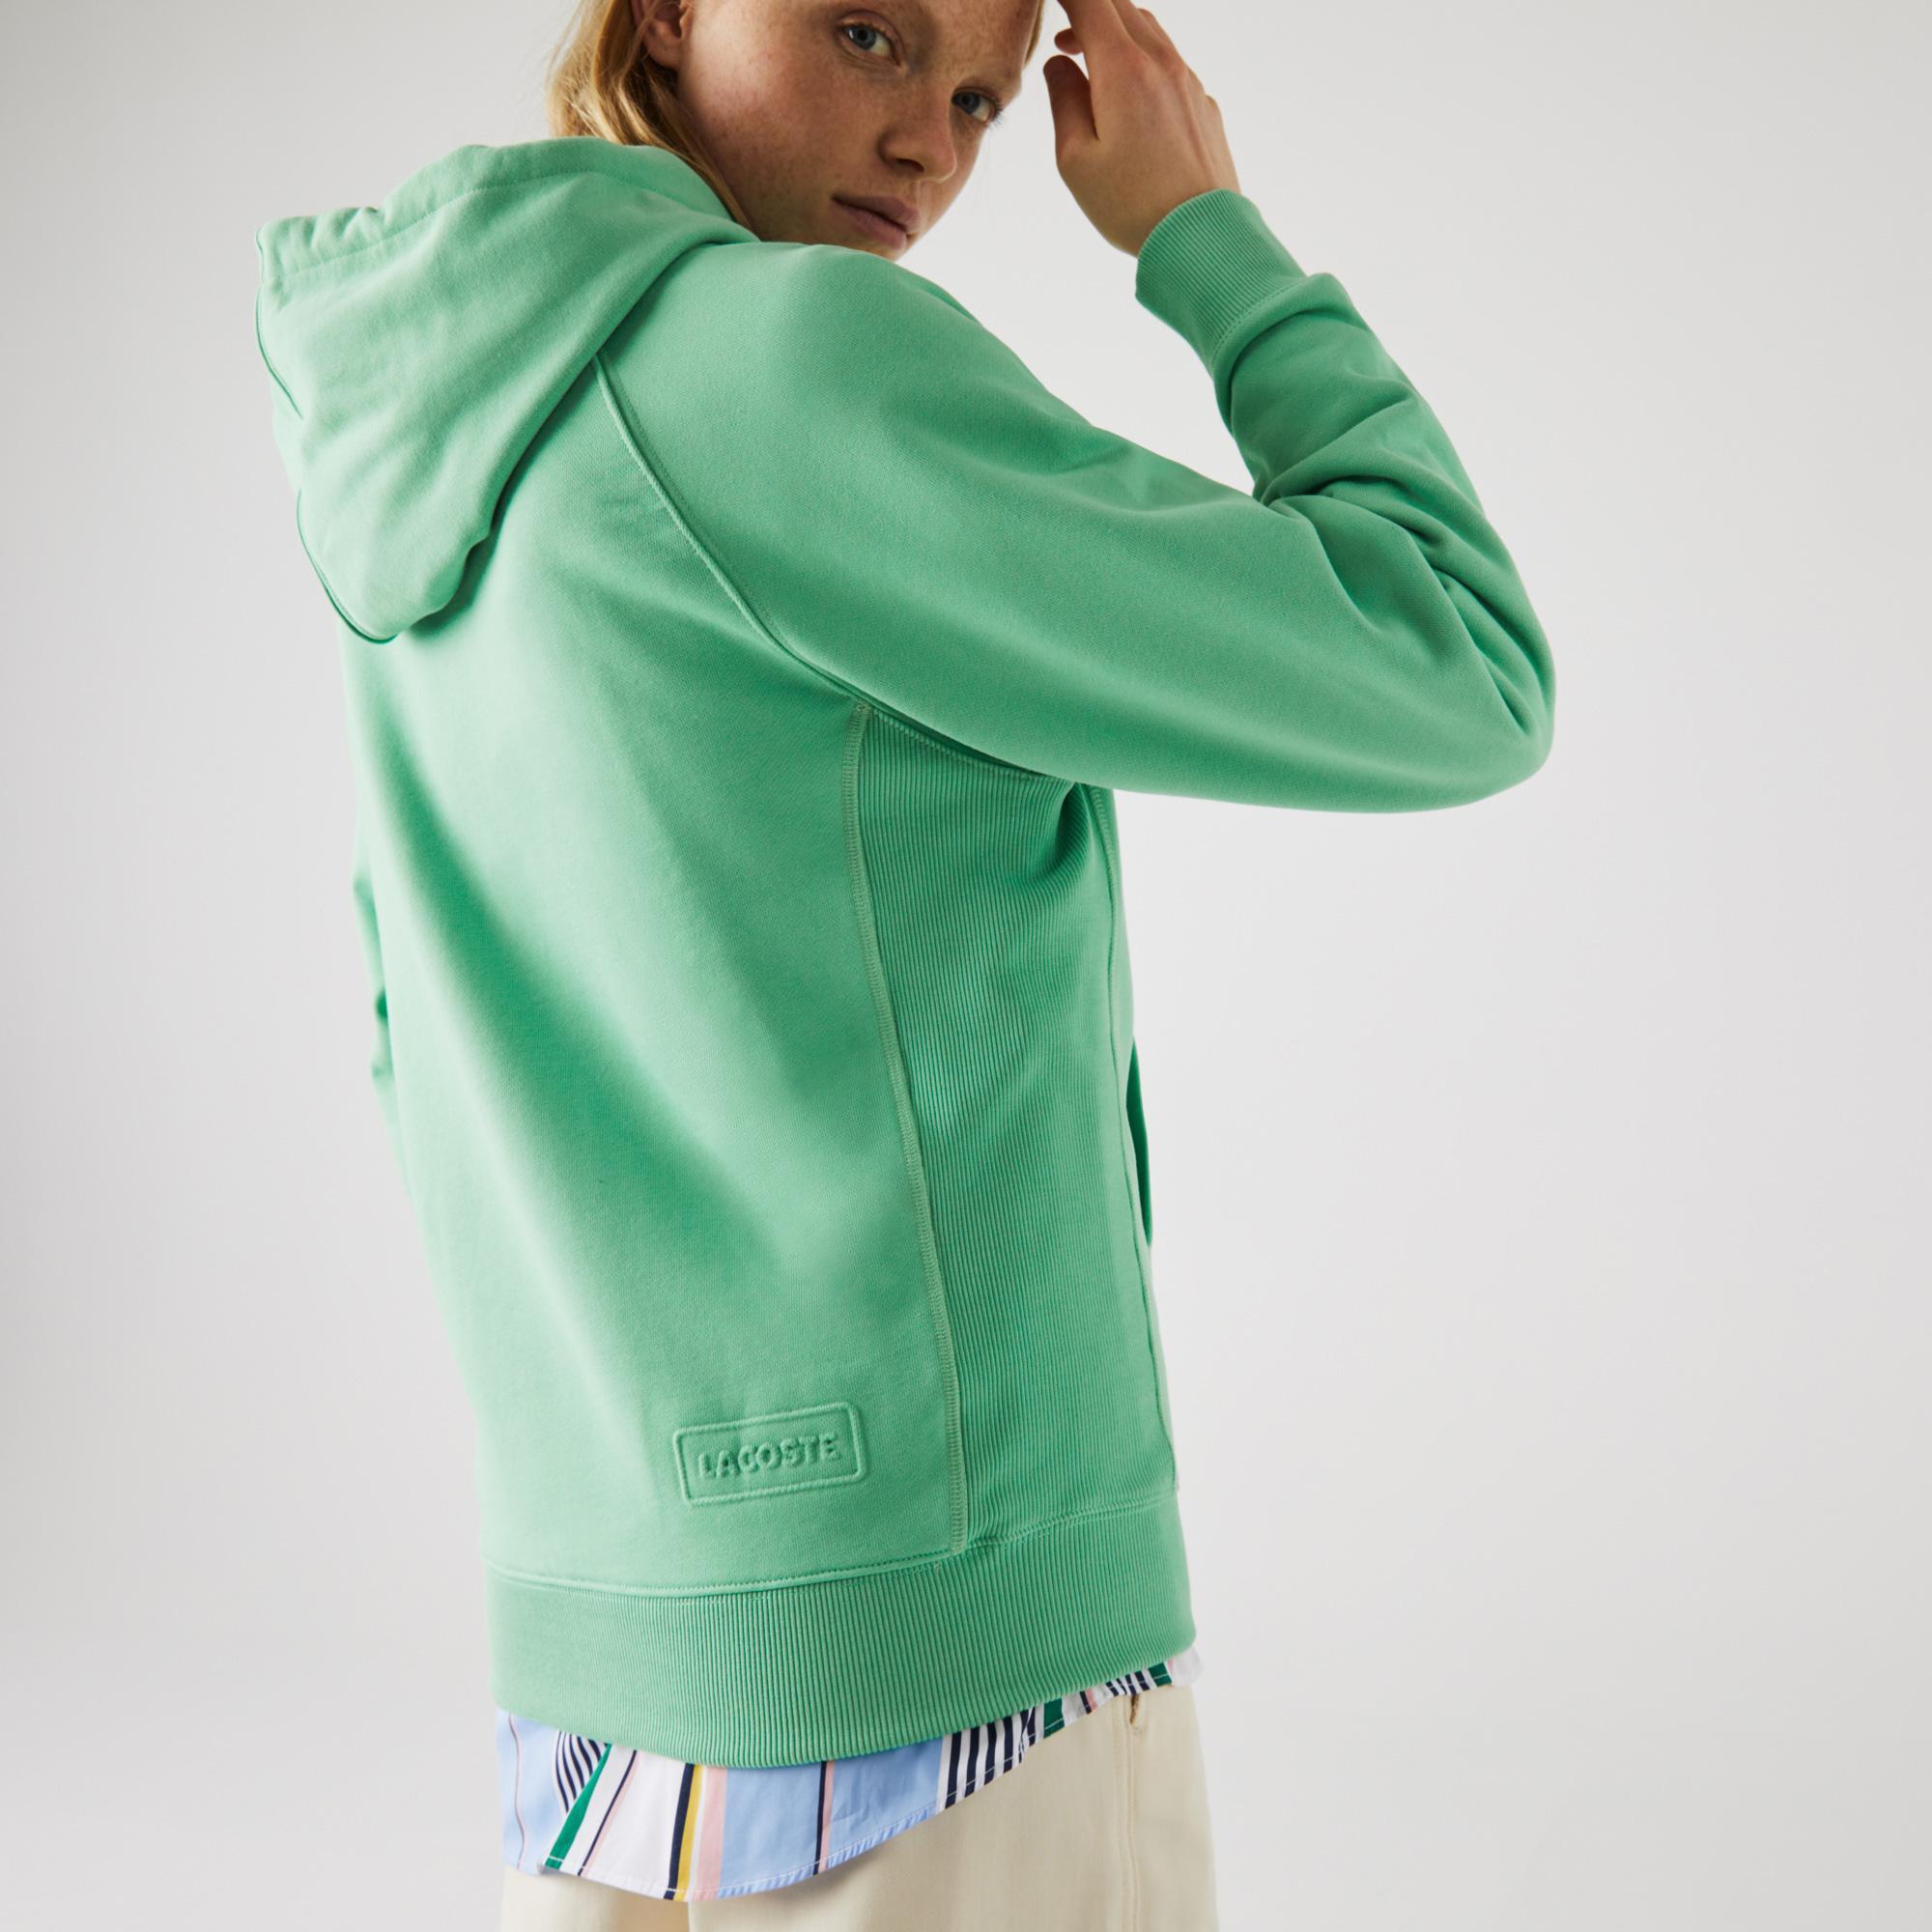 Lacoste L!VE Unisex Hooded Cotton Sweatshirt